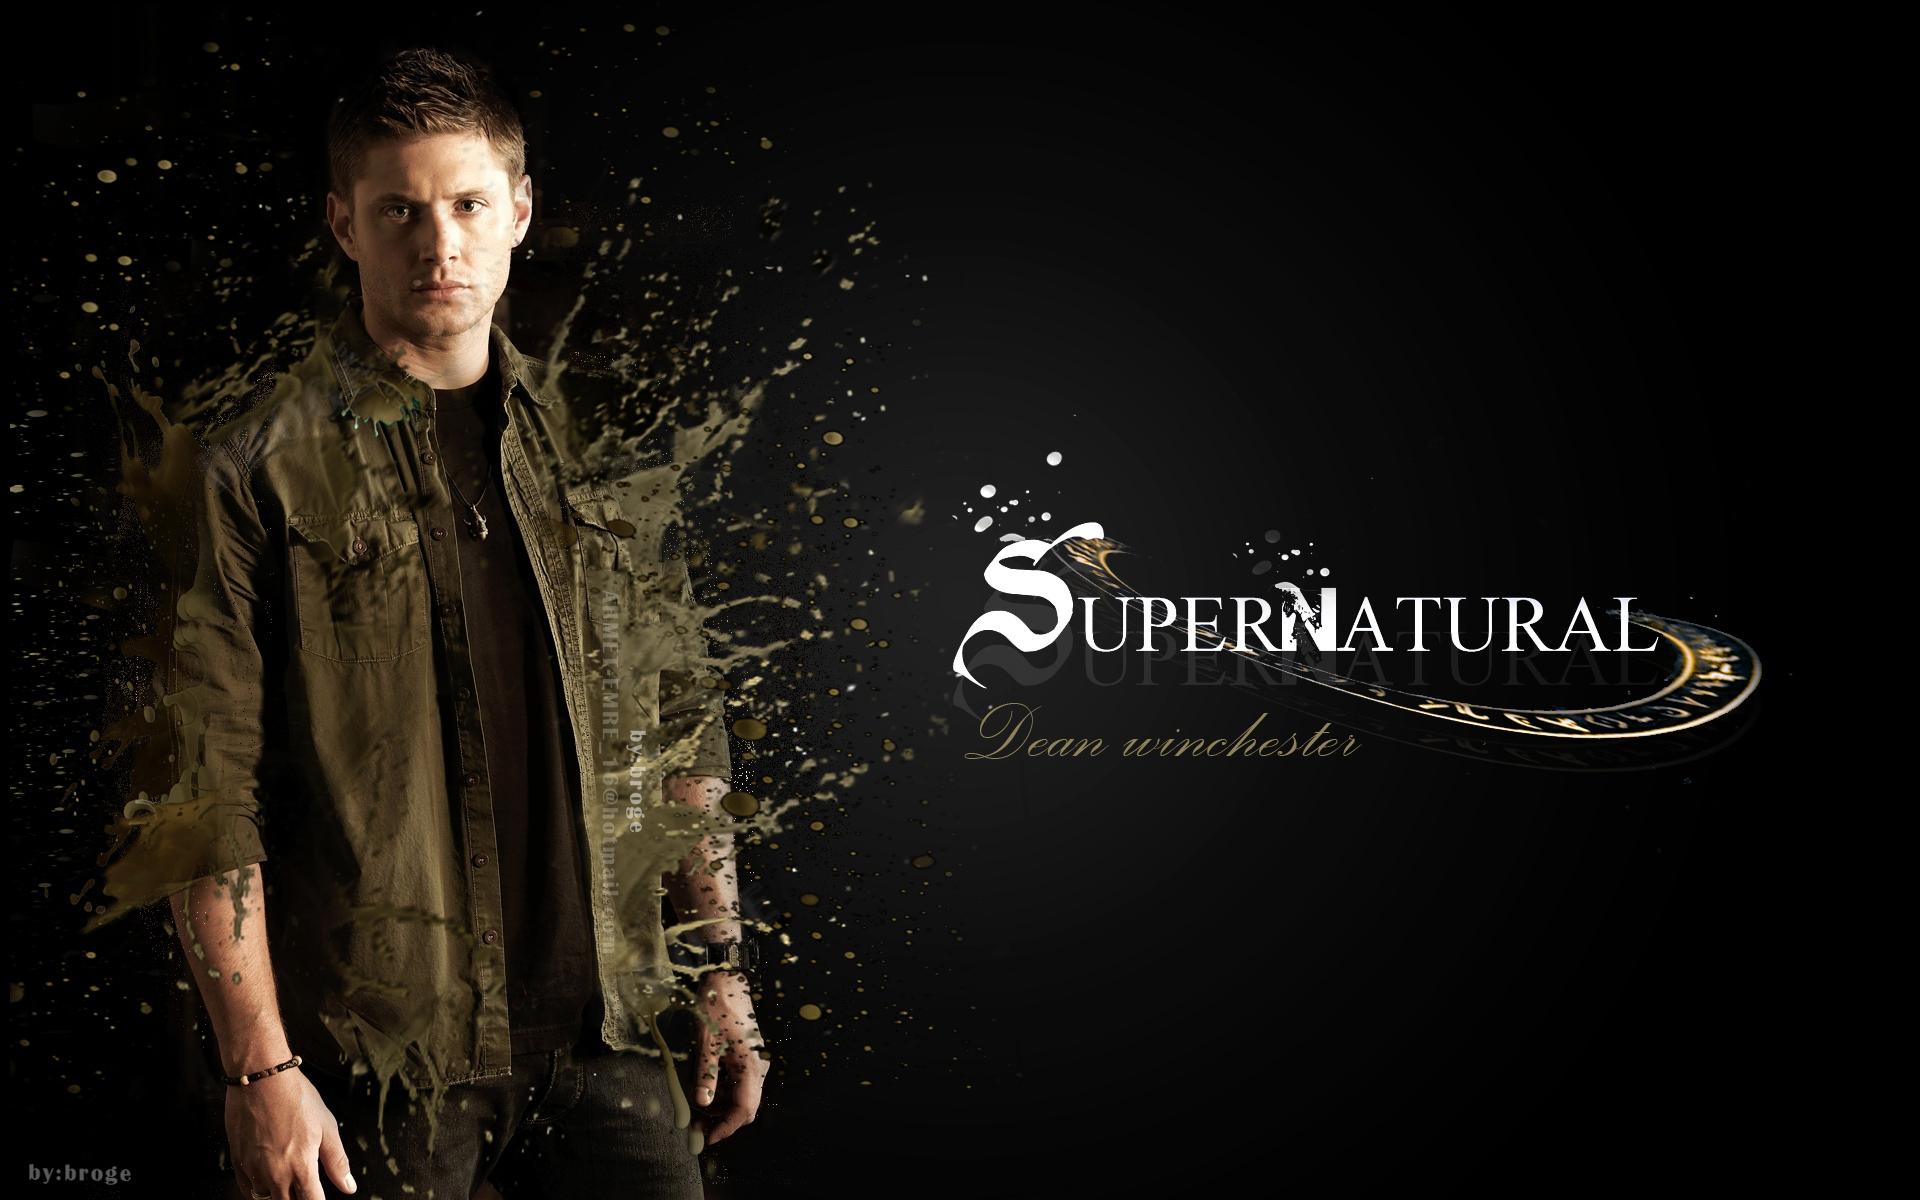 Supernatural images su...